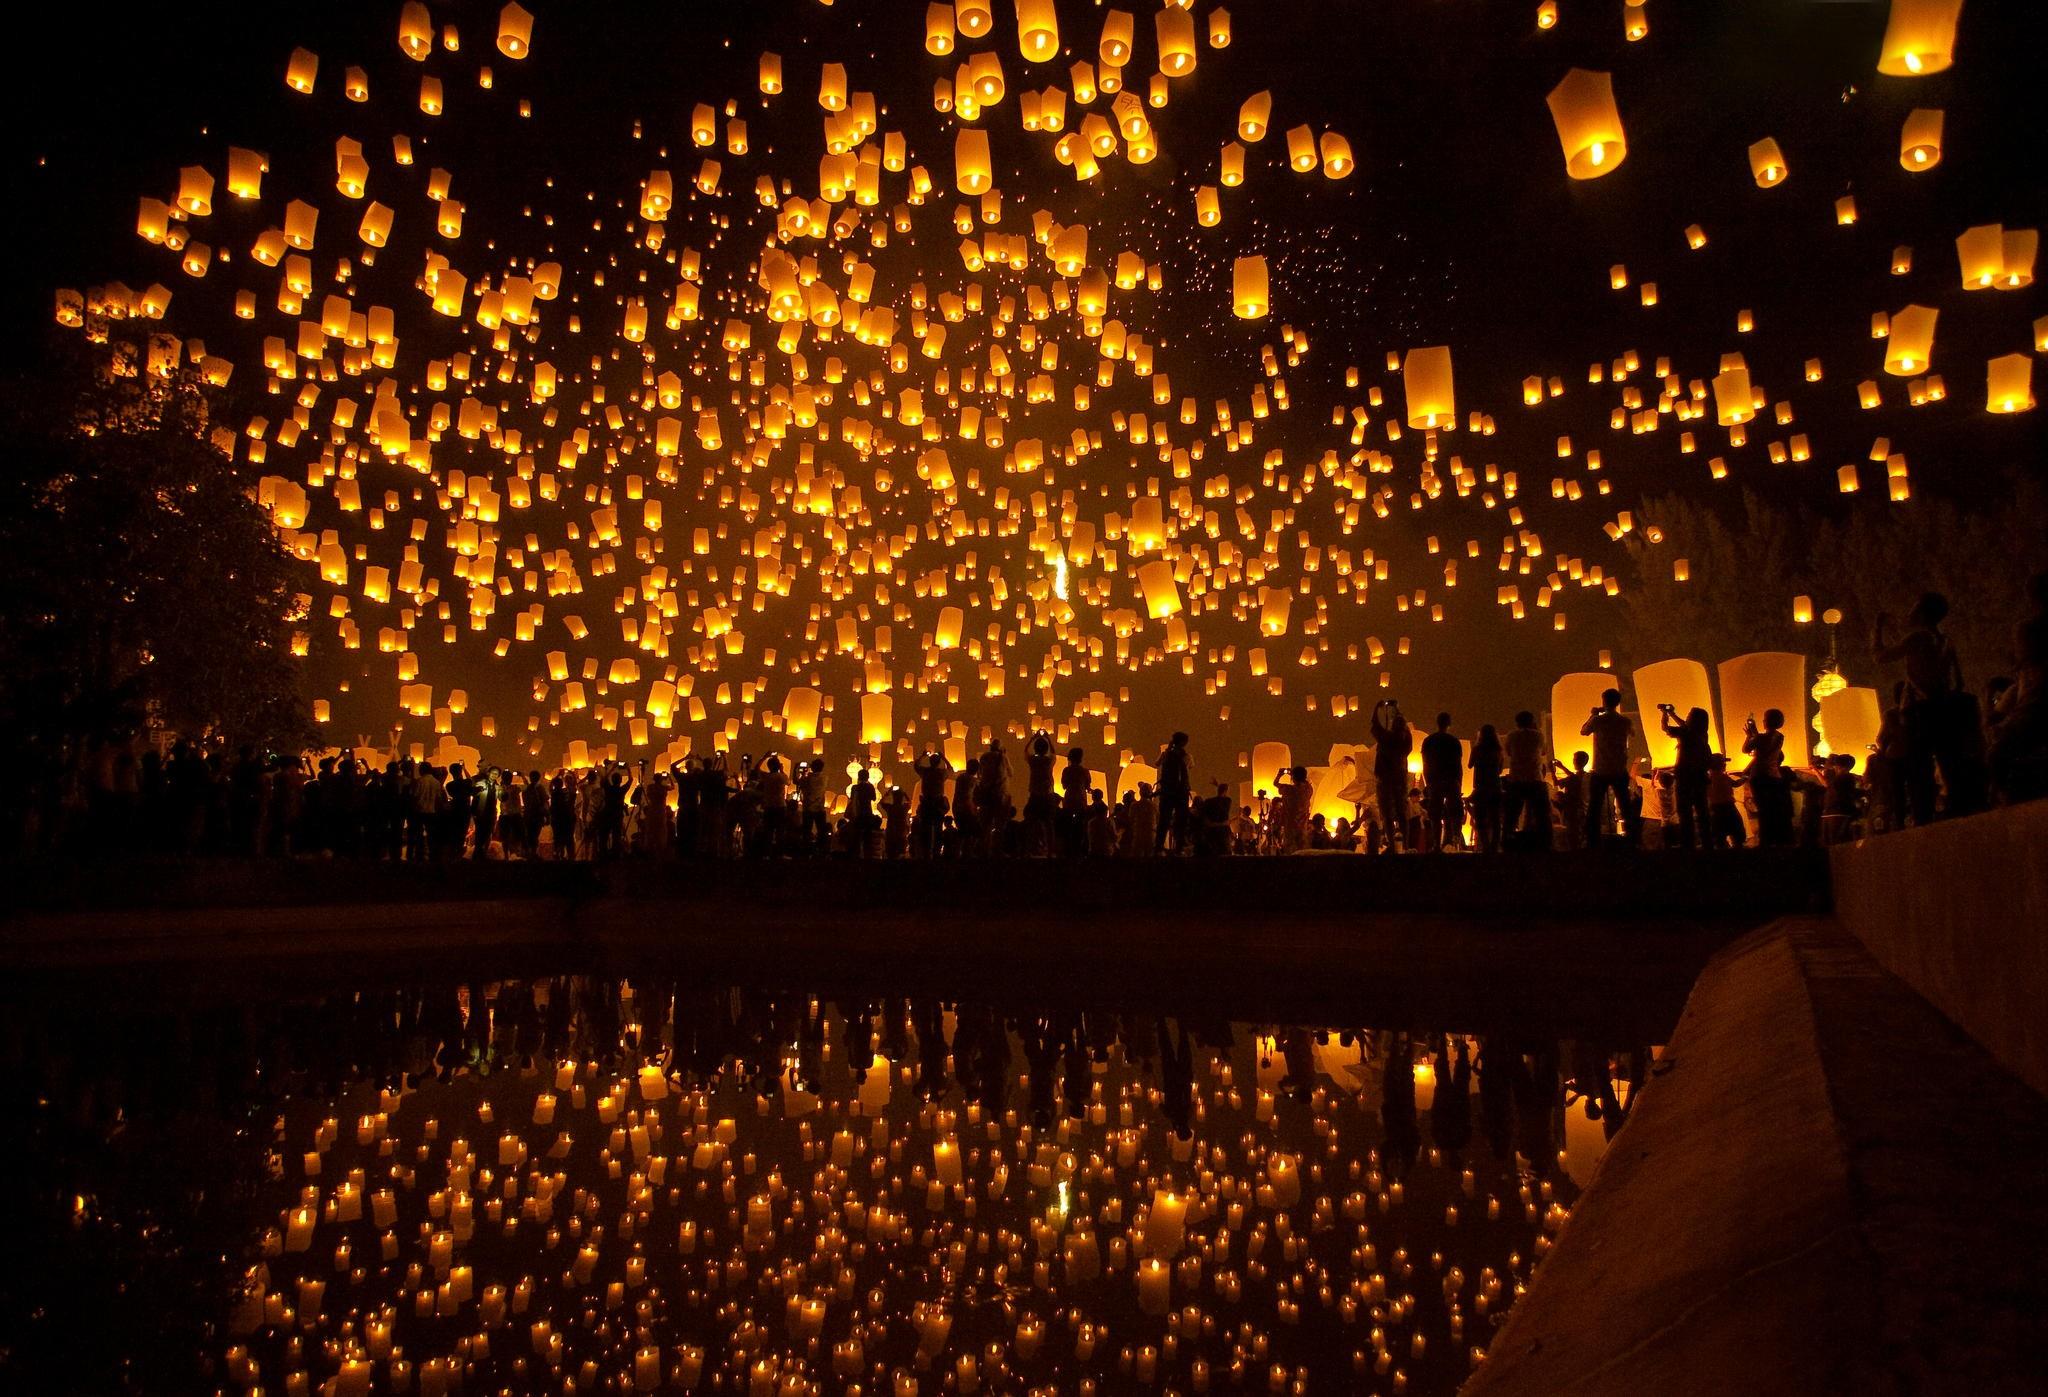 Amazing Wallpaper Night Lantern - night-China-water-reflection-silhouette-lantern-evening-sparkler-sky-lanterns-light-lighting-darkness-256687  Image-95328.jpg